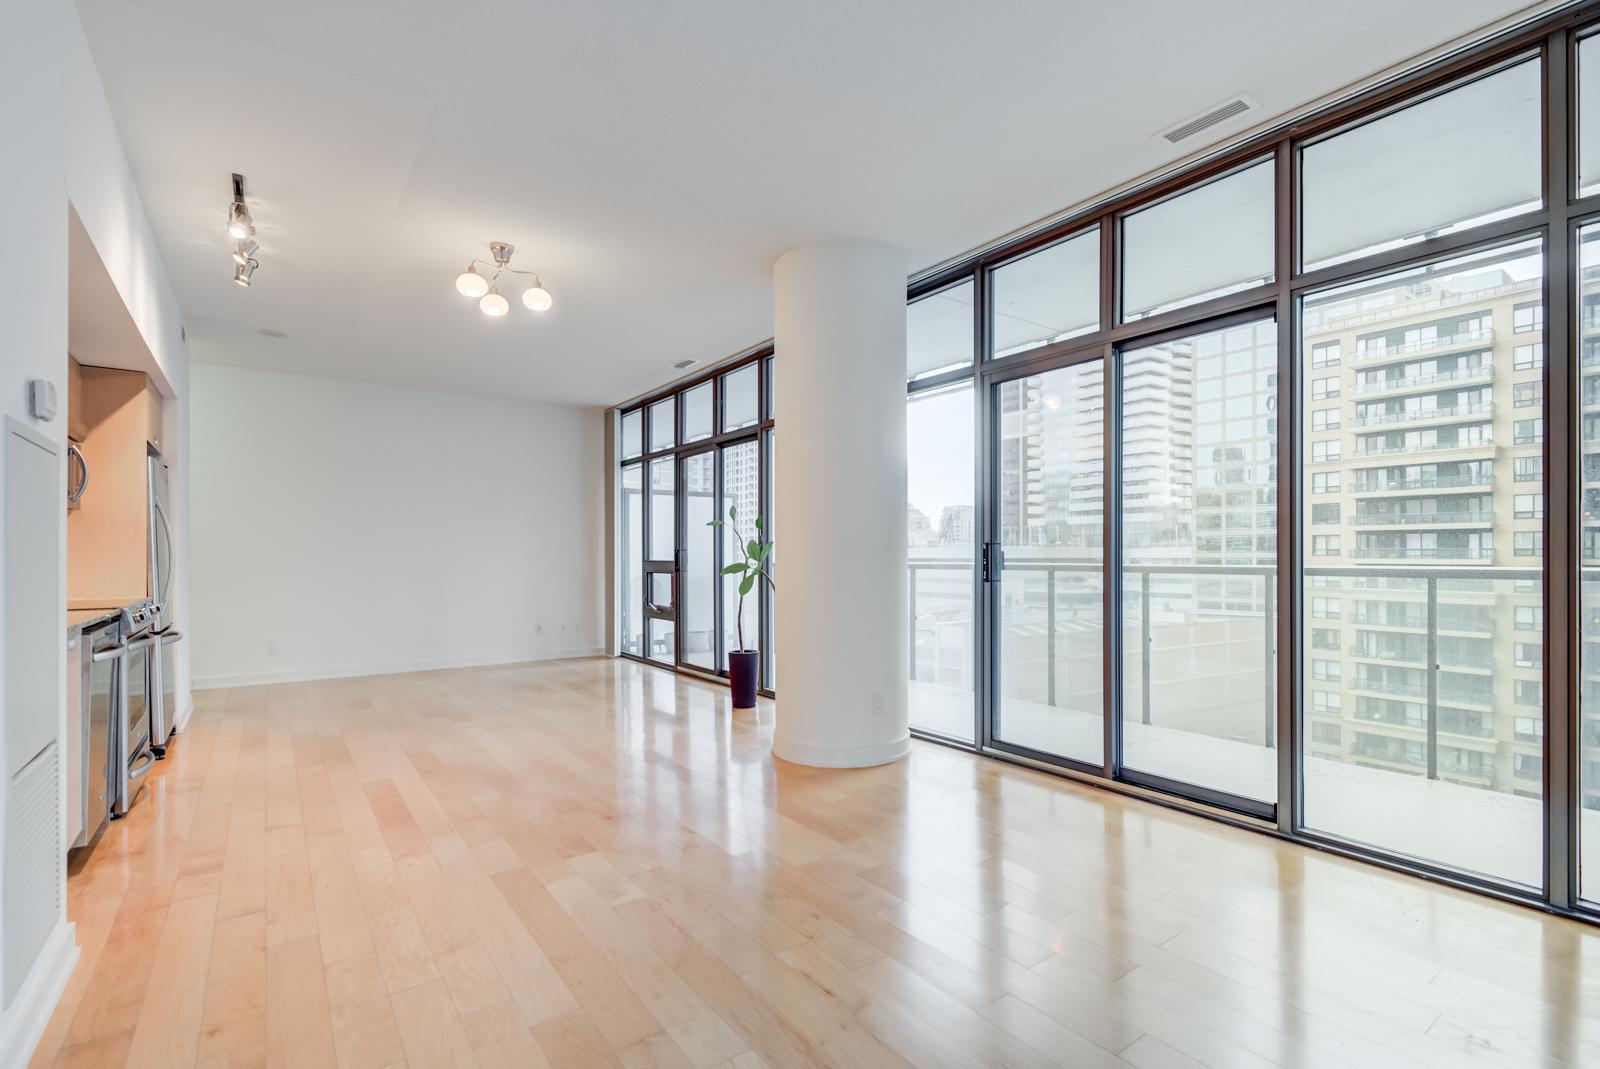 Casa Condos - Windows and plant and sunlight